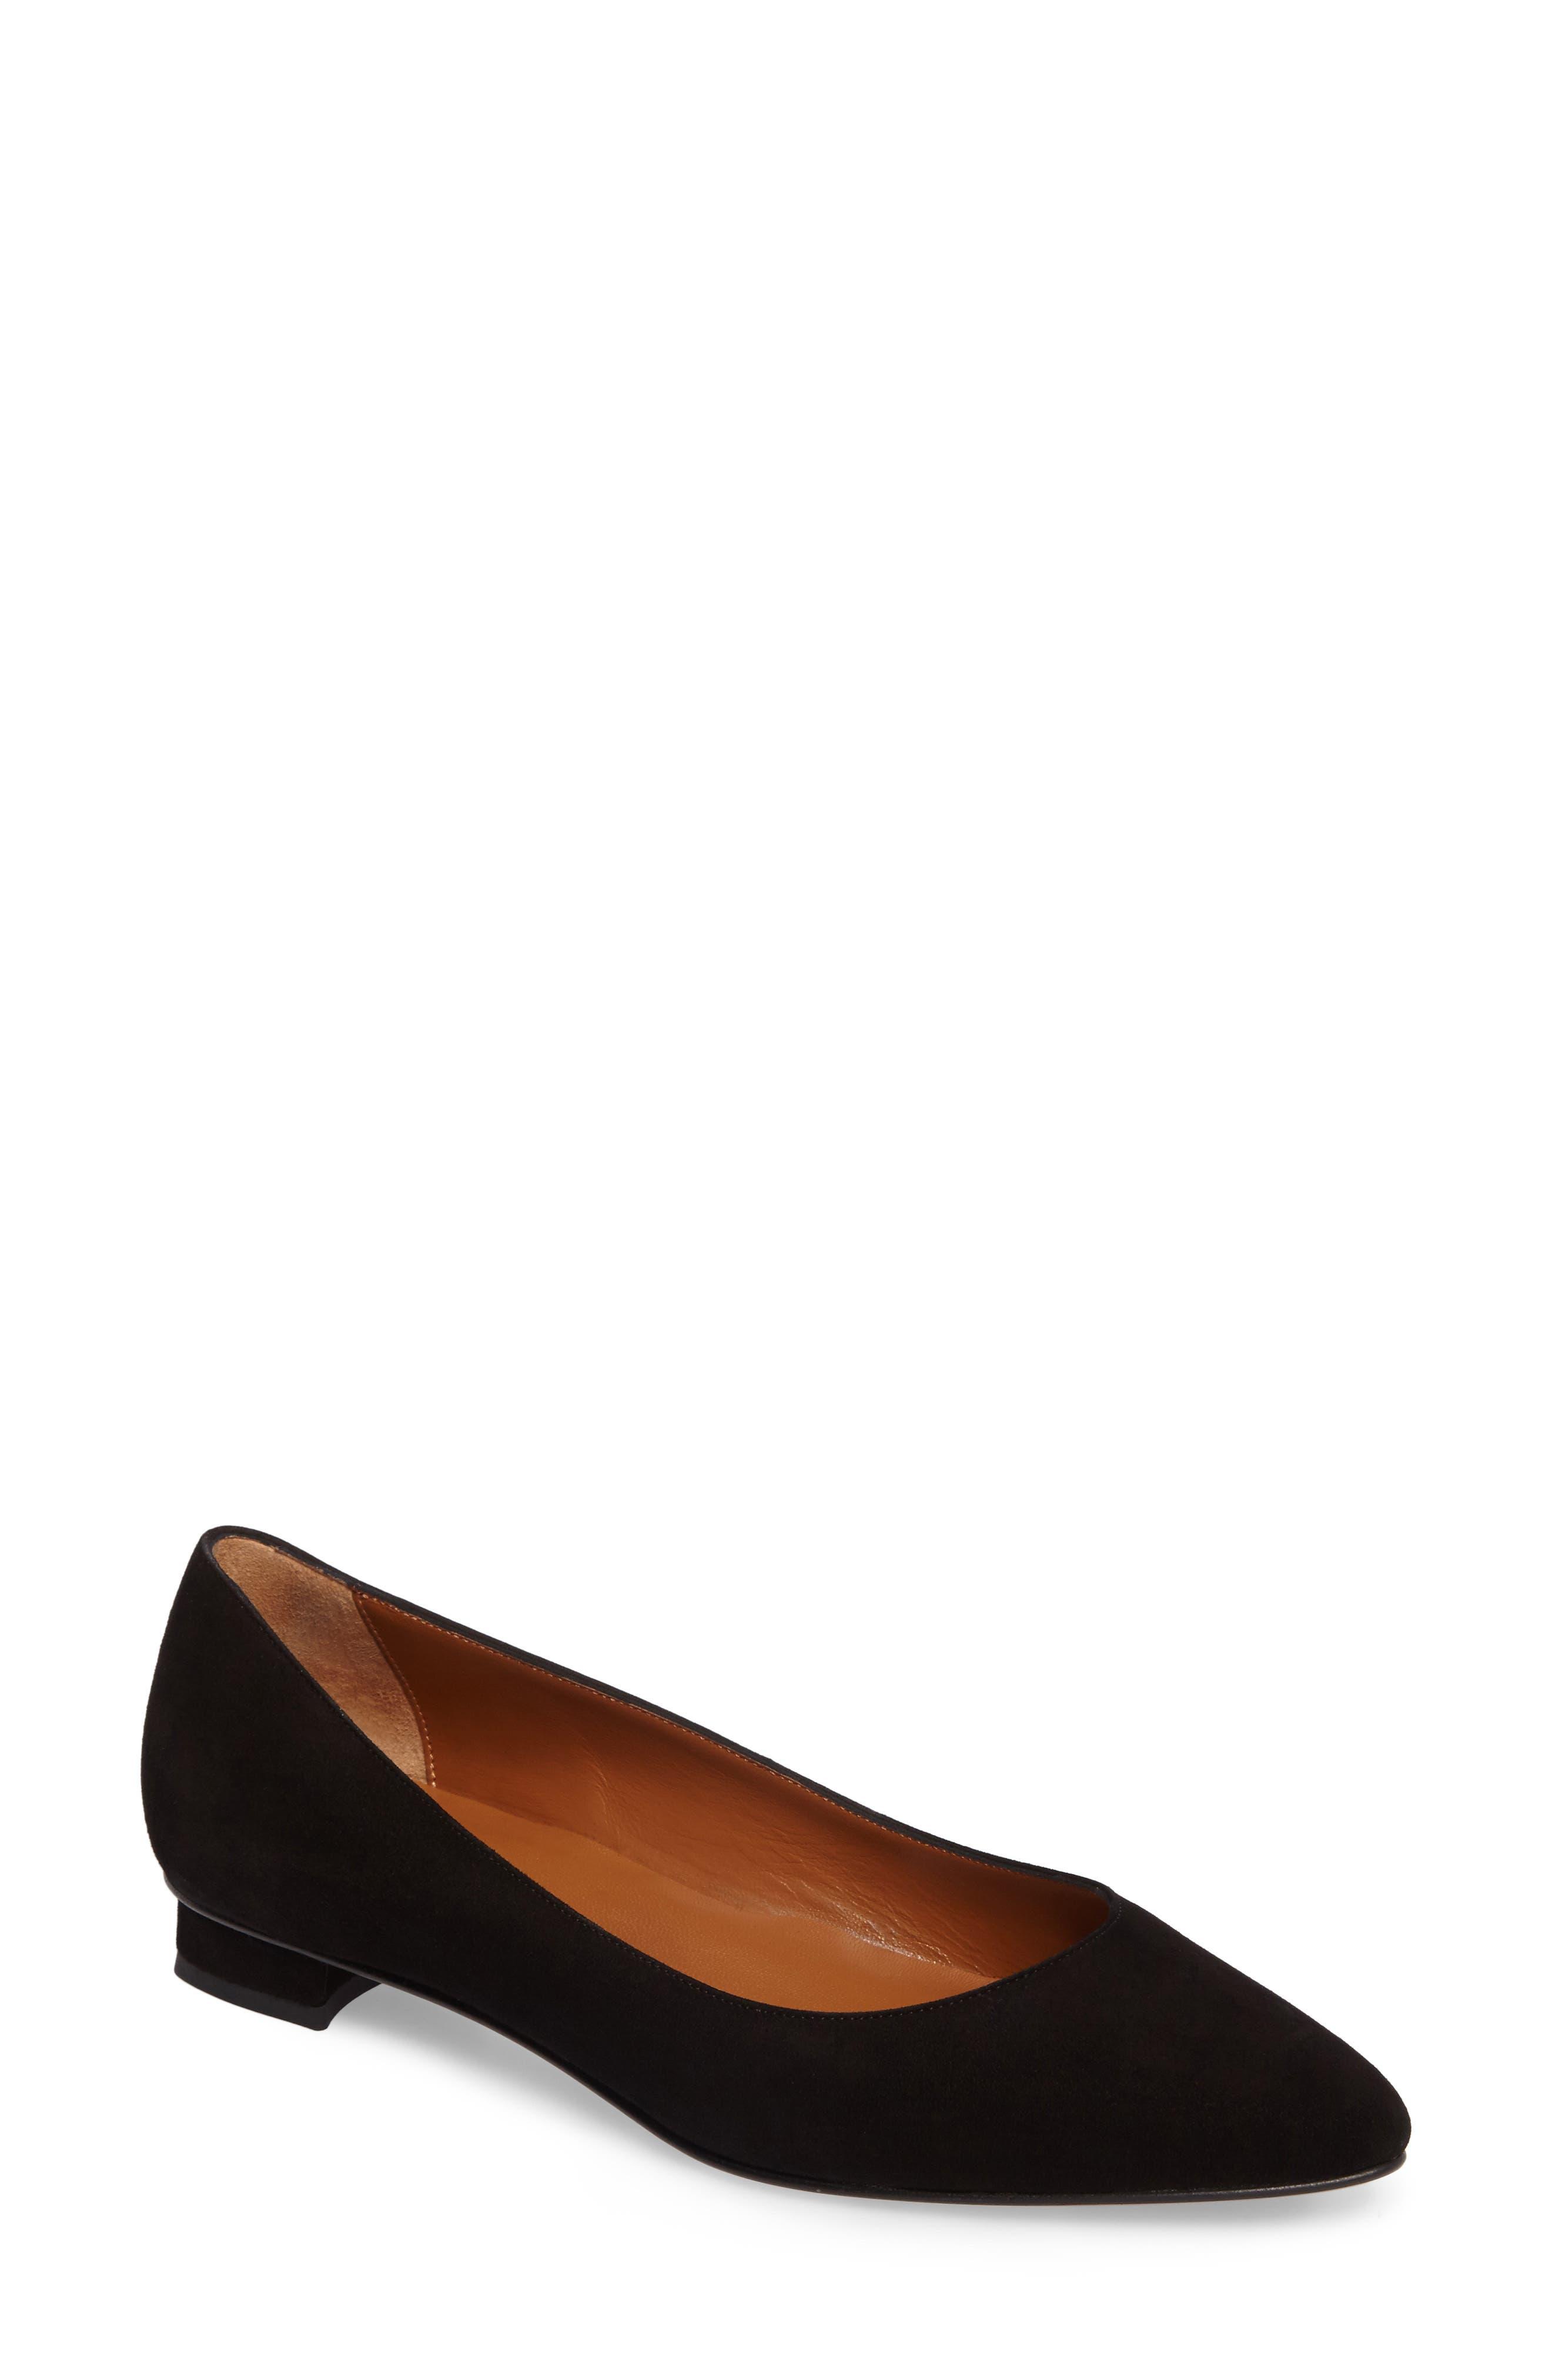 Perla Weatherproof Ballerina Shoe,                             Main thumbnail 1, color,                             Black Suede